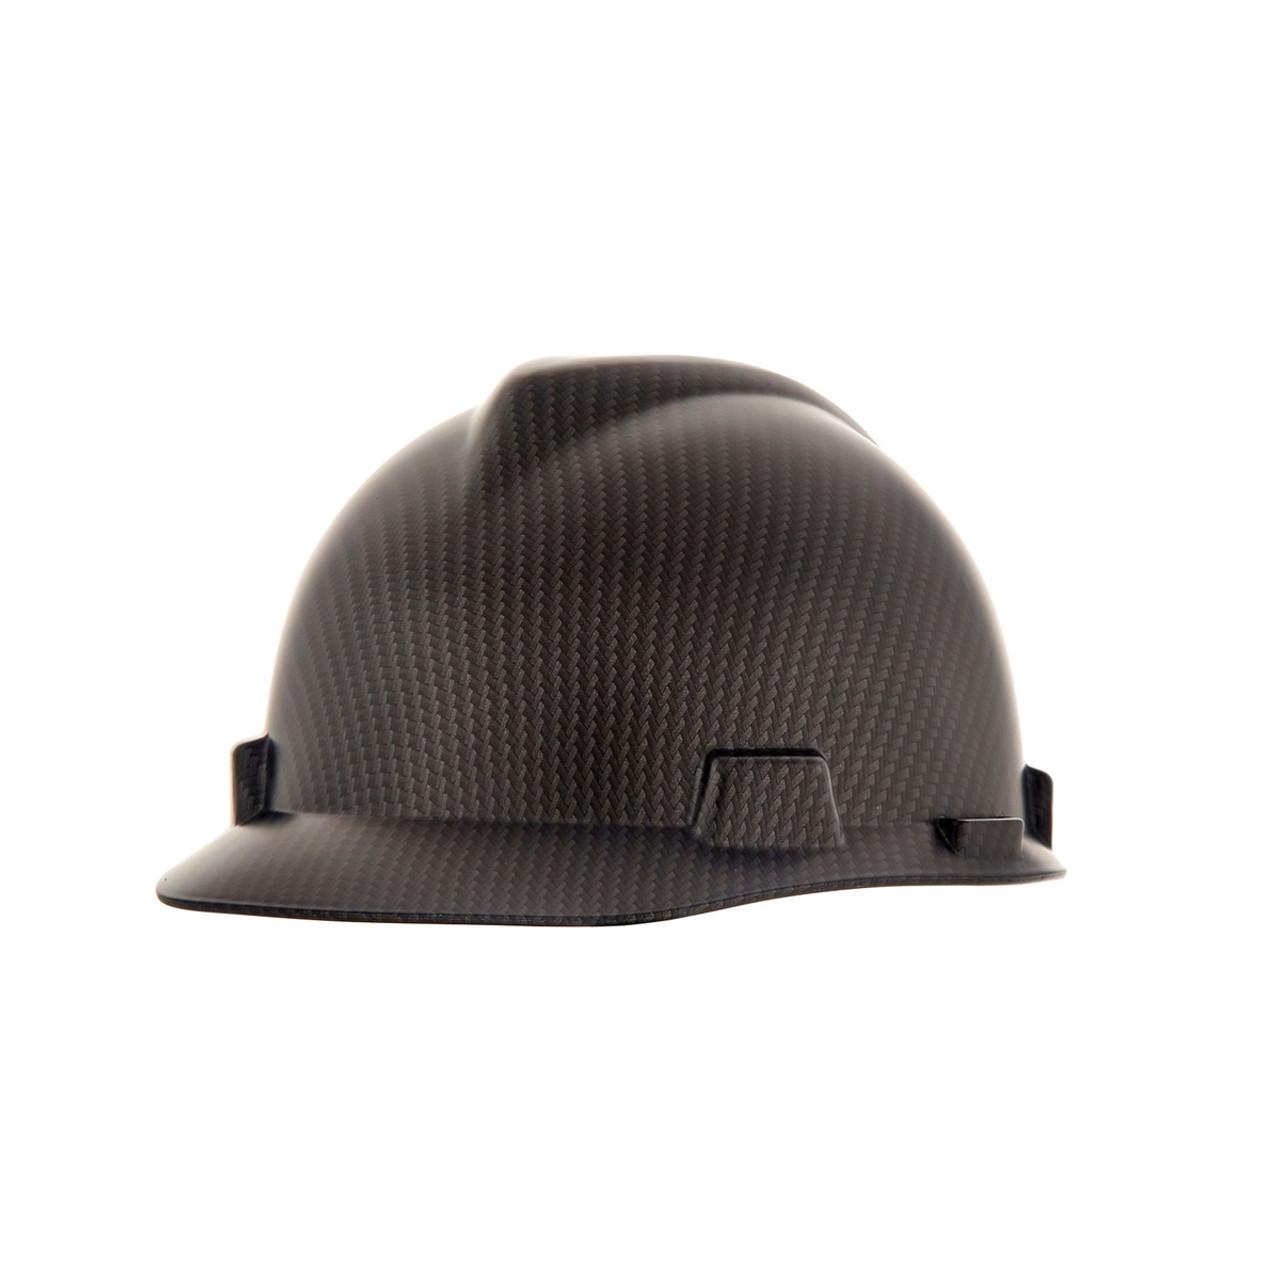 Hard Hat MSA V-Gard Cap Style Custom Truue Weave Carbon Fiber Hydro Dipped